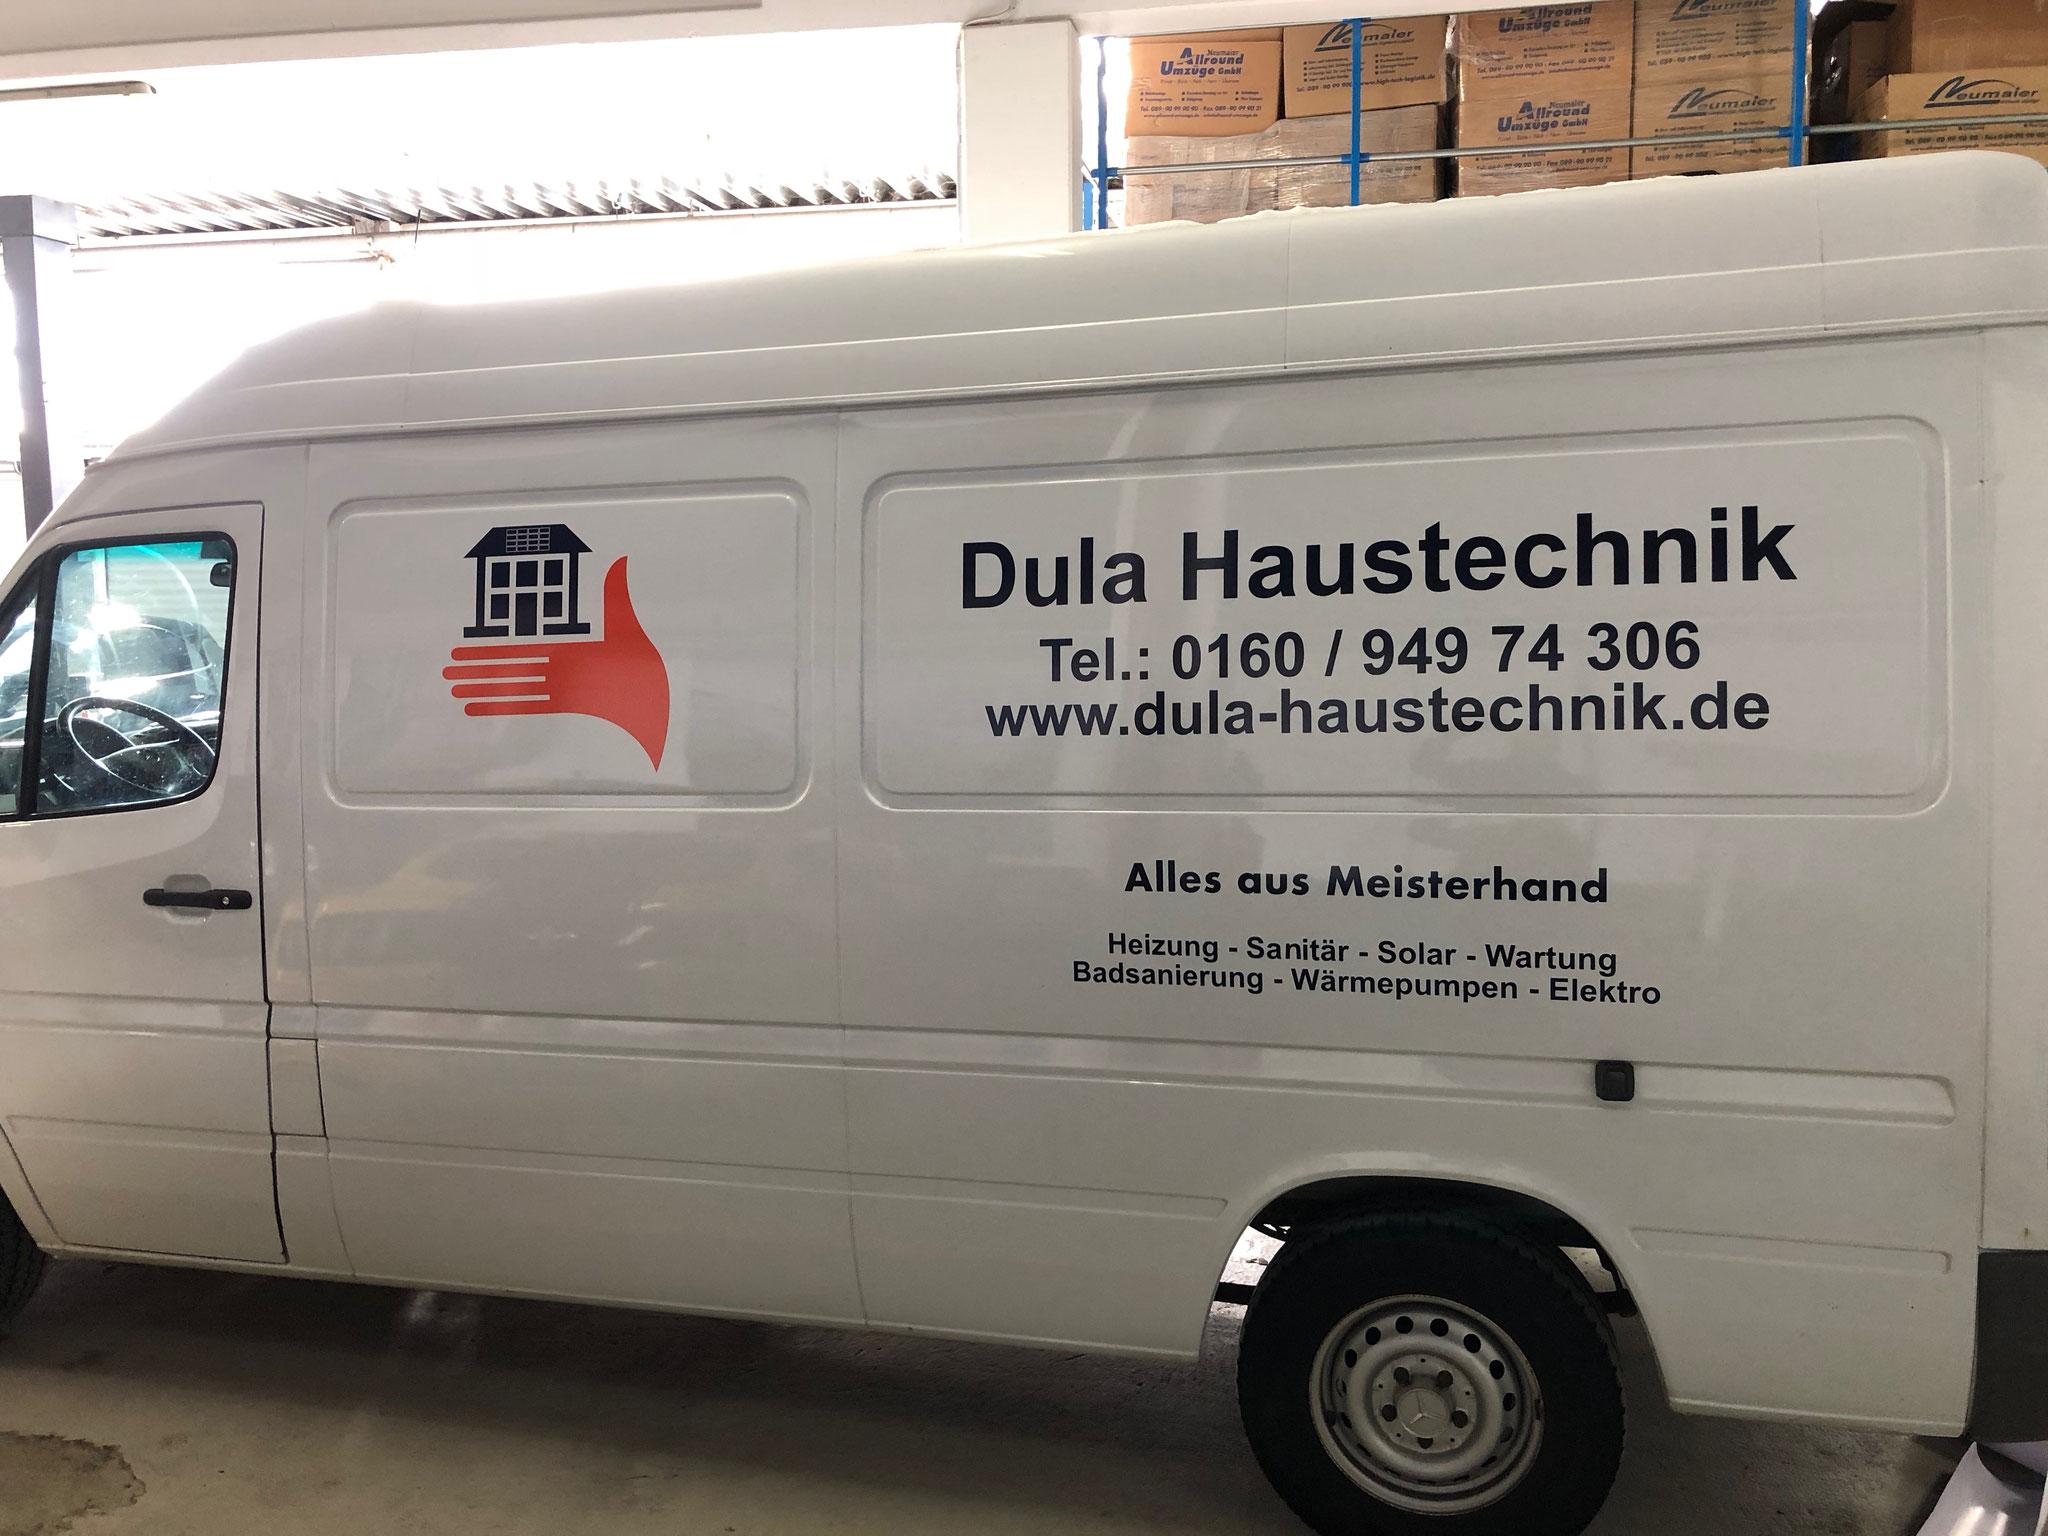 Dula Haustechnik Autobeschriftung in München